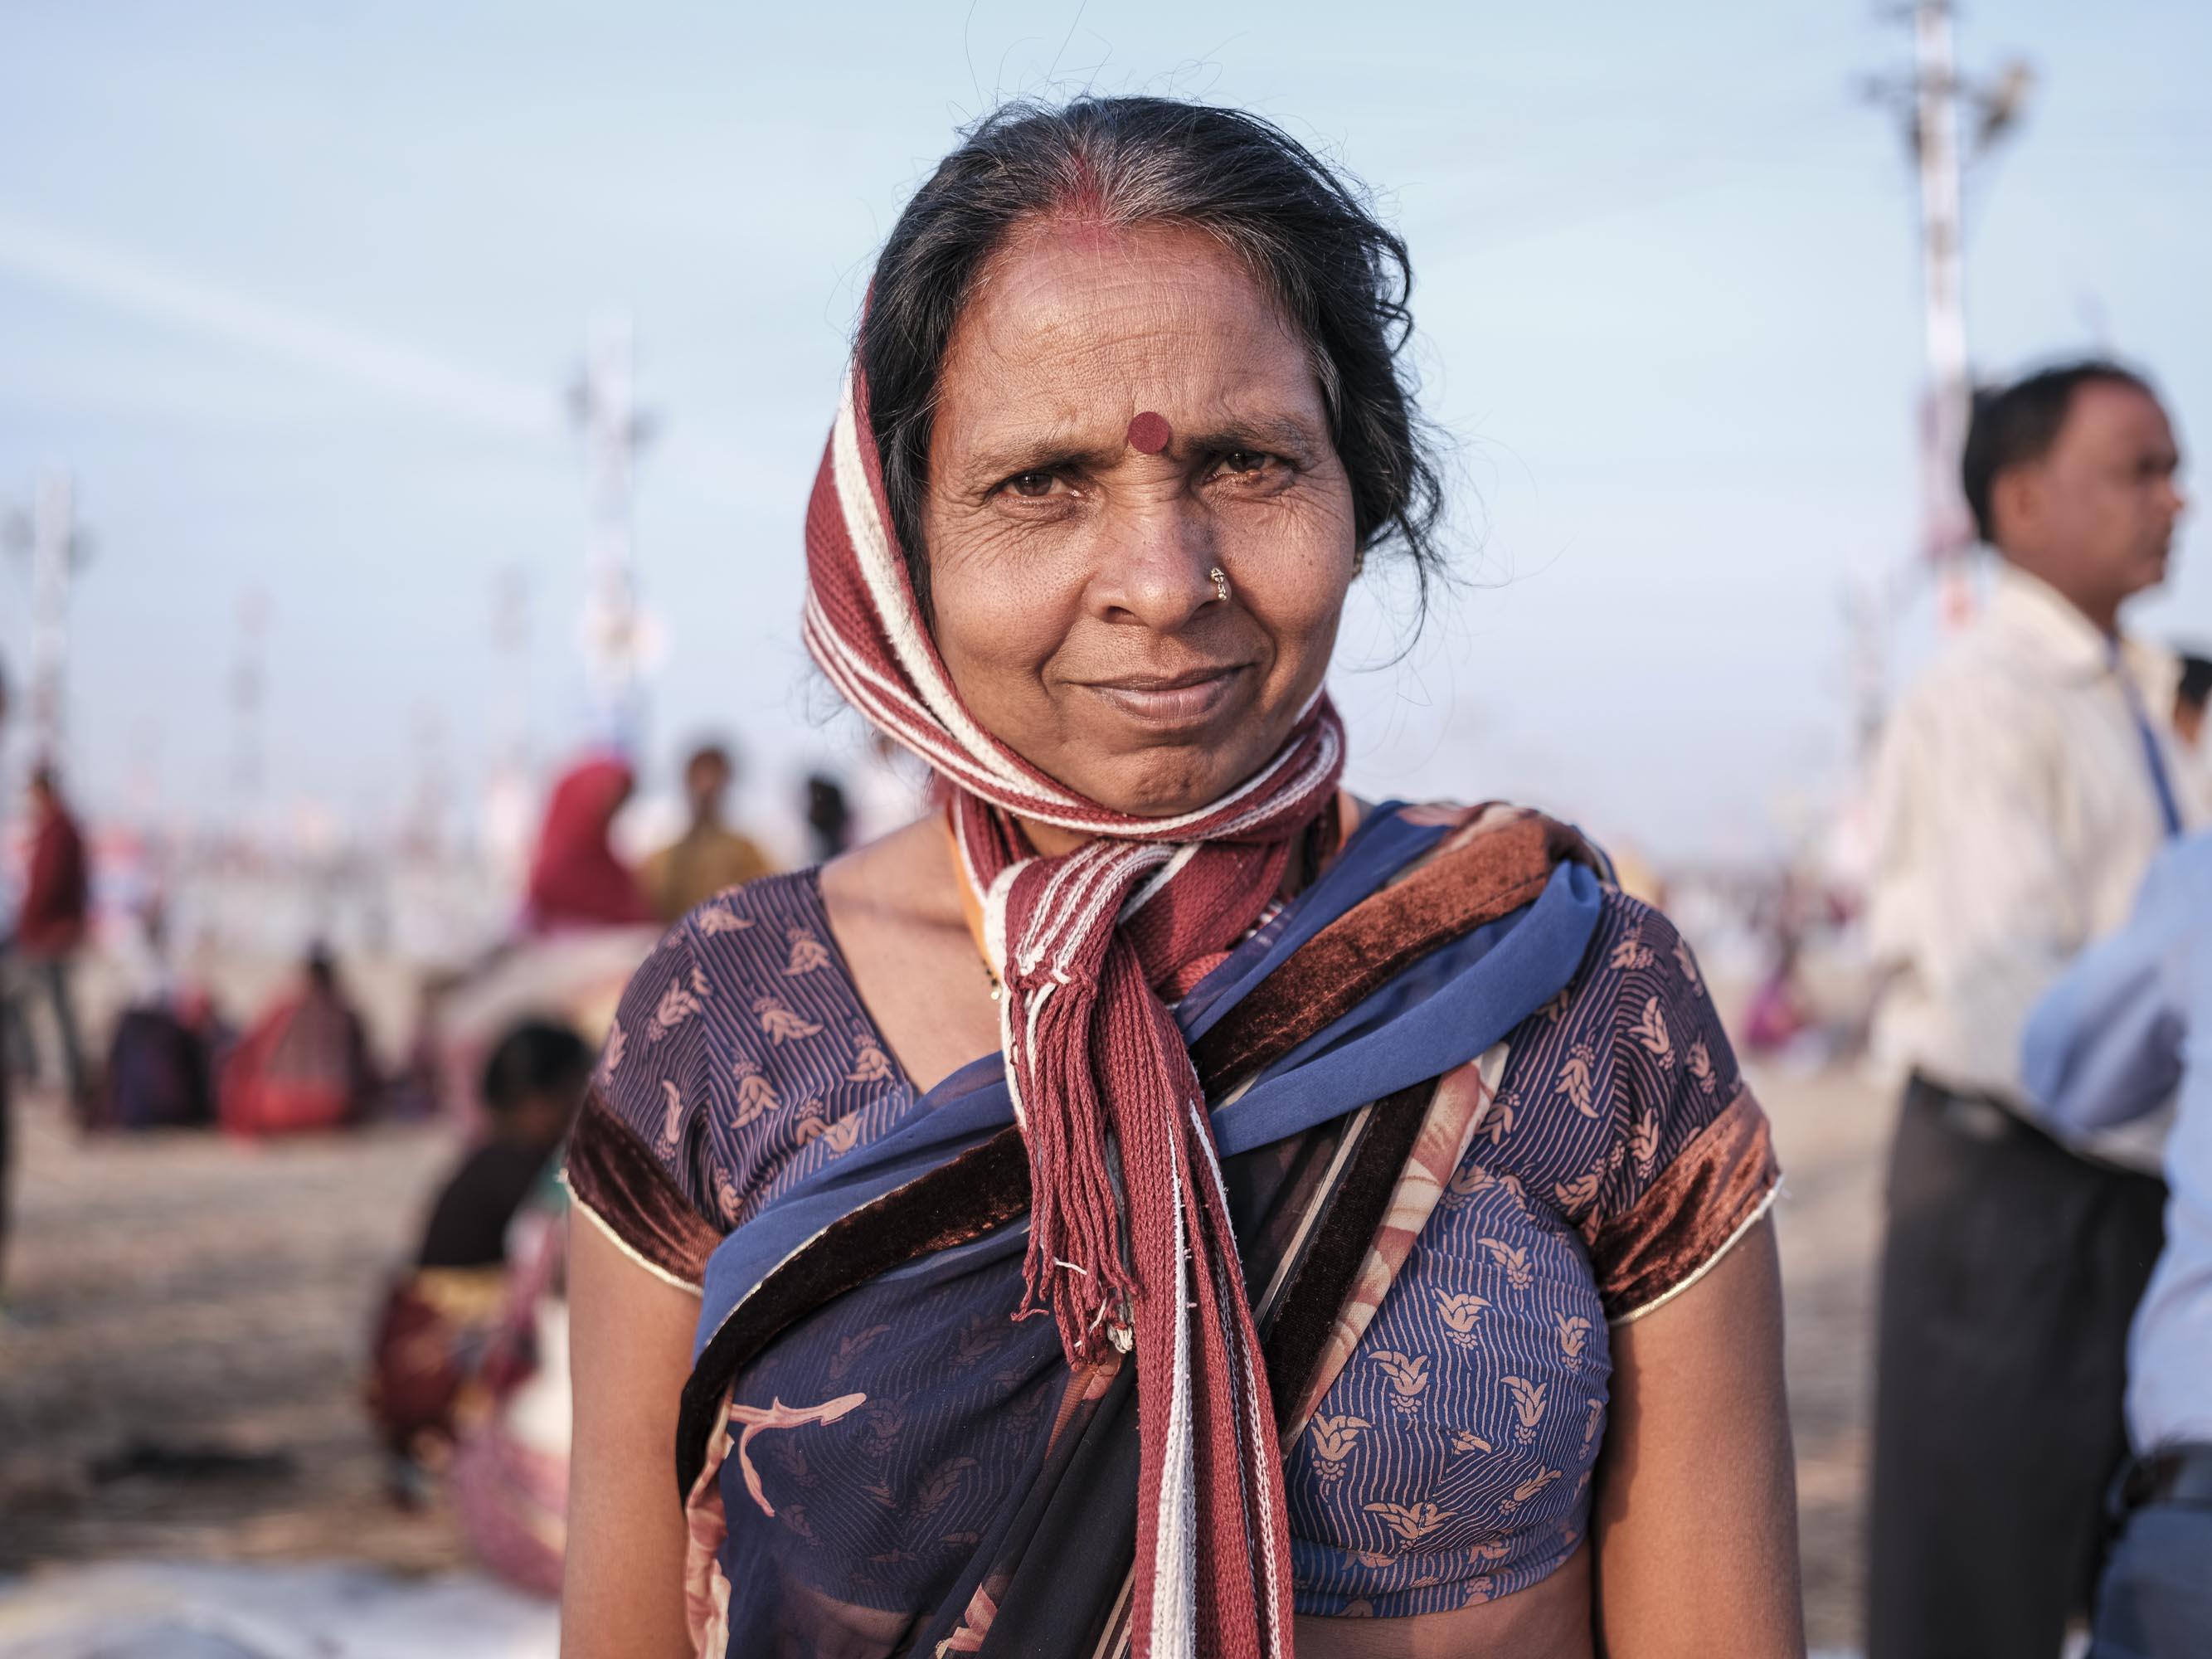 after bath lady pilgrims Kumbh mela 2019 India Allahabad Prayagraj Ardh hindu religious Festival event rivers photographer jose jeuland photography